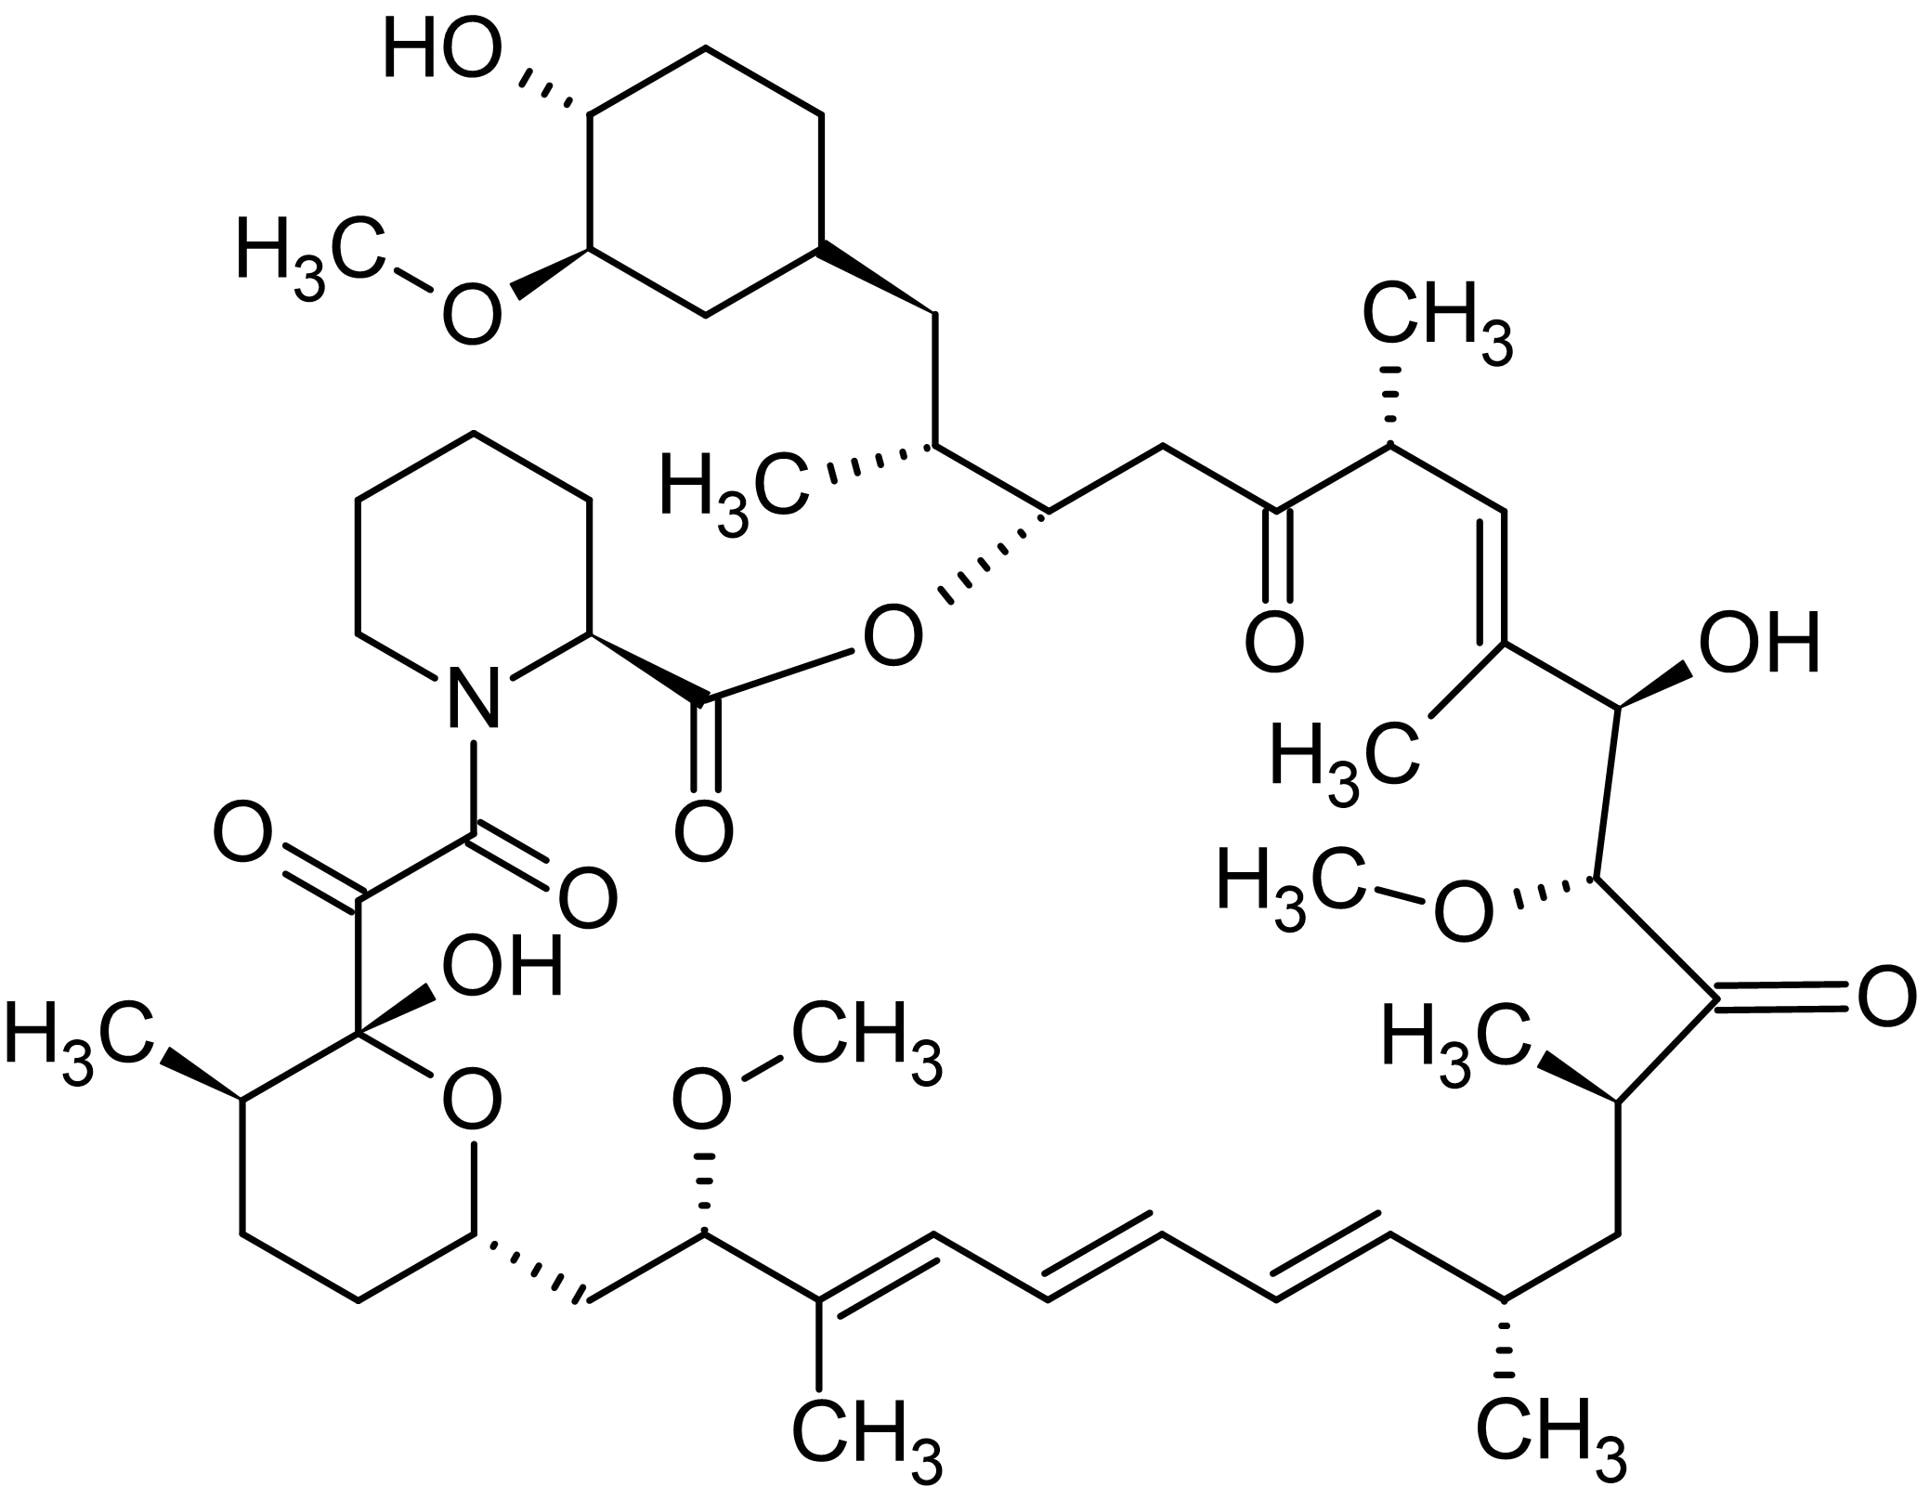 Chemical Structure - Rapamycin (DMSO solution), immunosuppressant (ab146591)